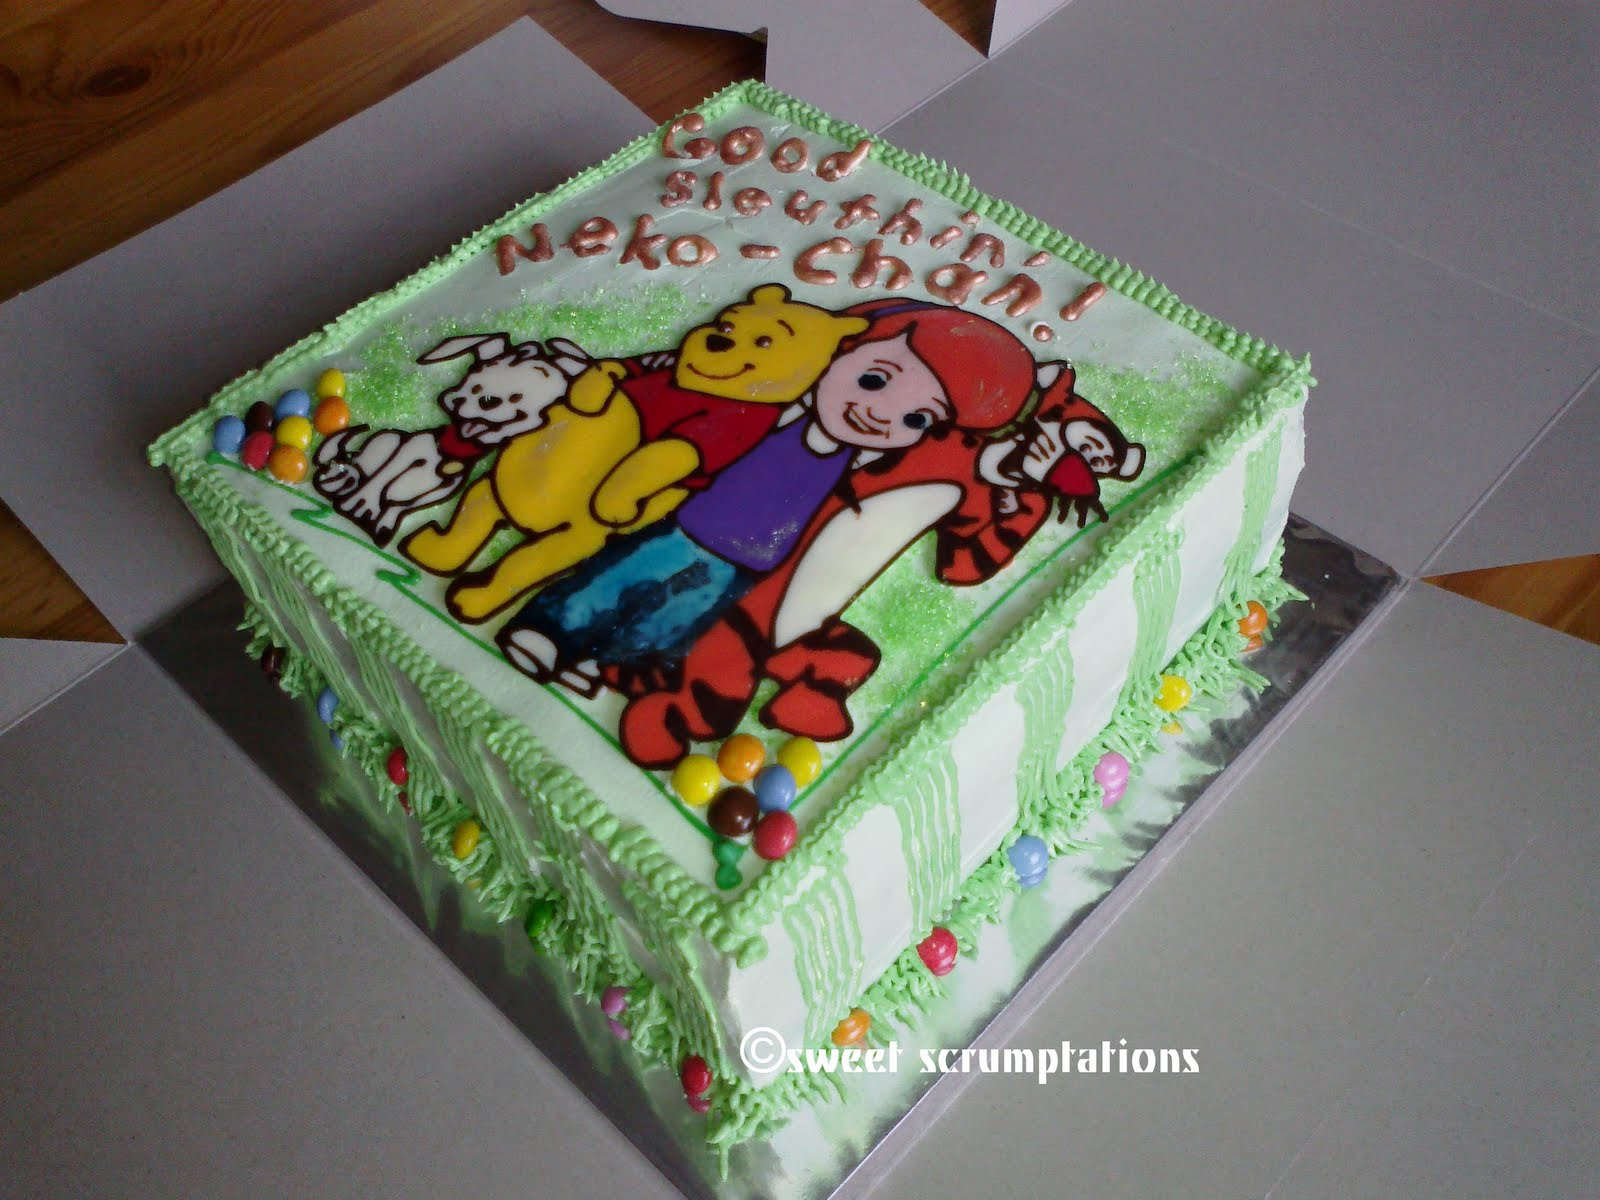 http://4.bp.blogspot.com/-dzy2QKds7_U/TaBlgHUpbXI/AAAAAAAADng/9d2XurG7tT4/s1600/Diana+winnie+pooh+side.jpg